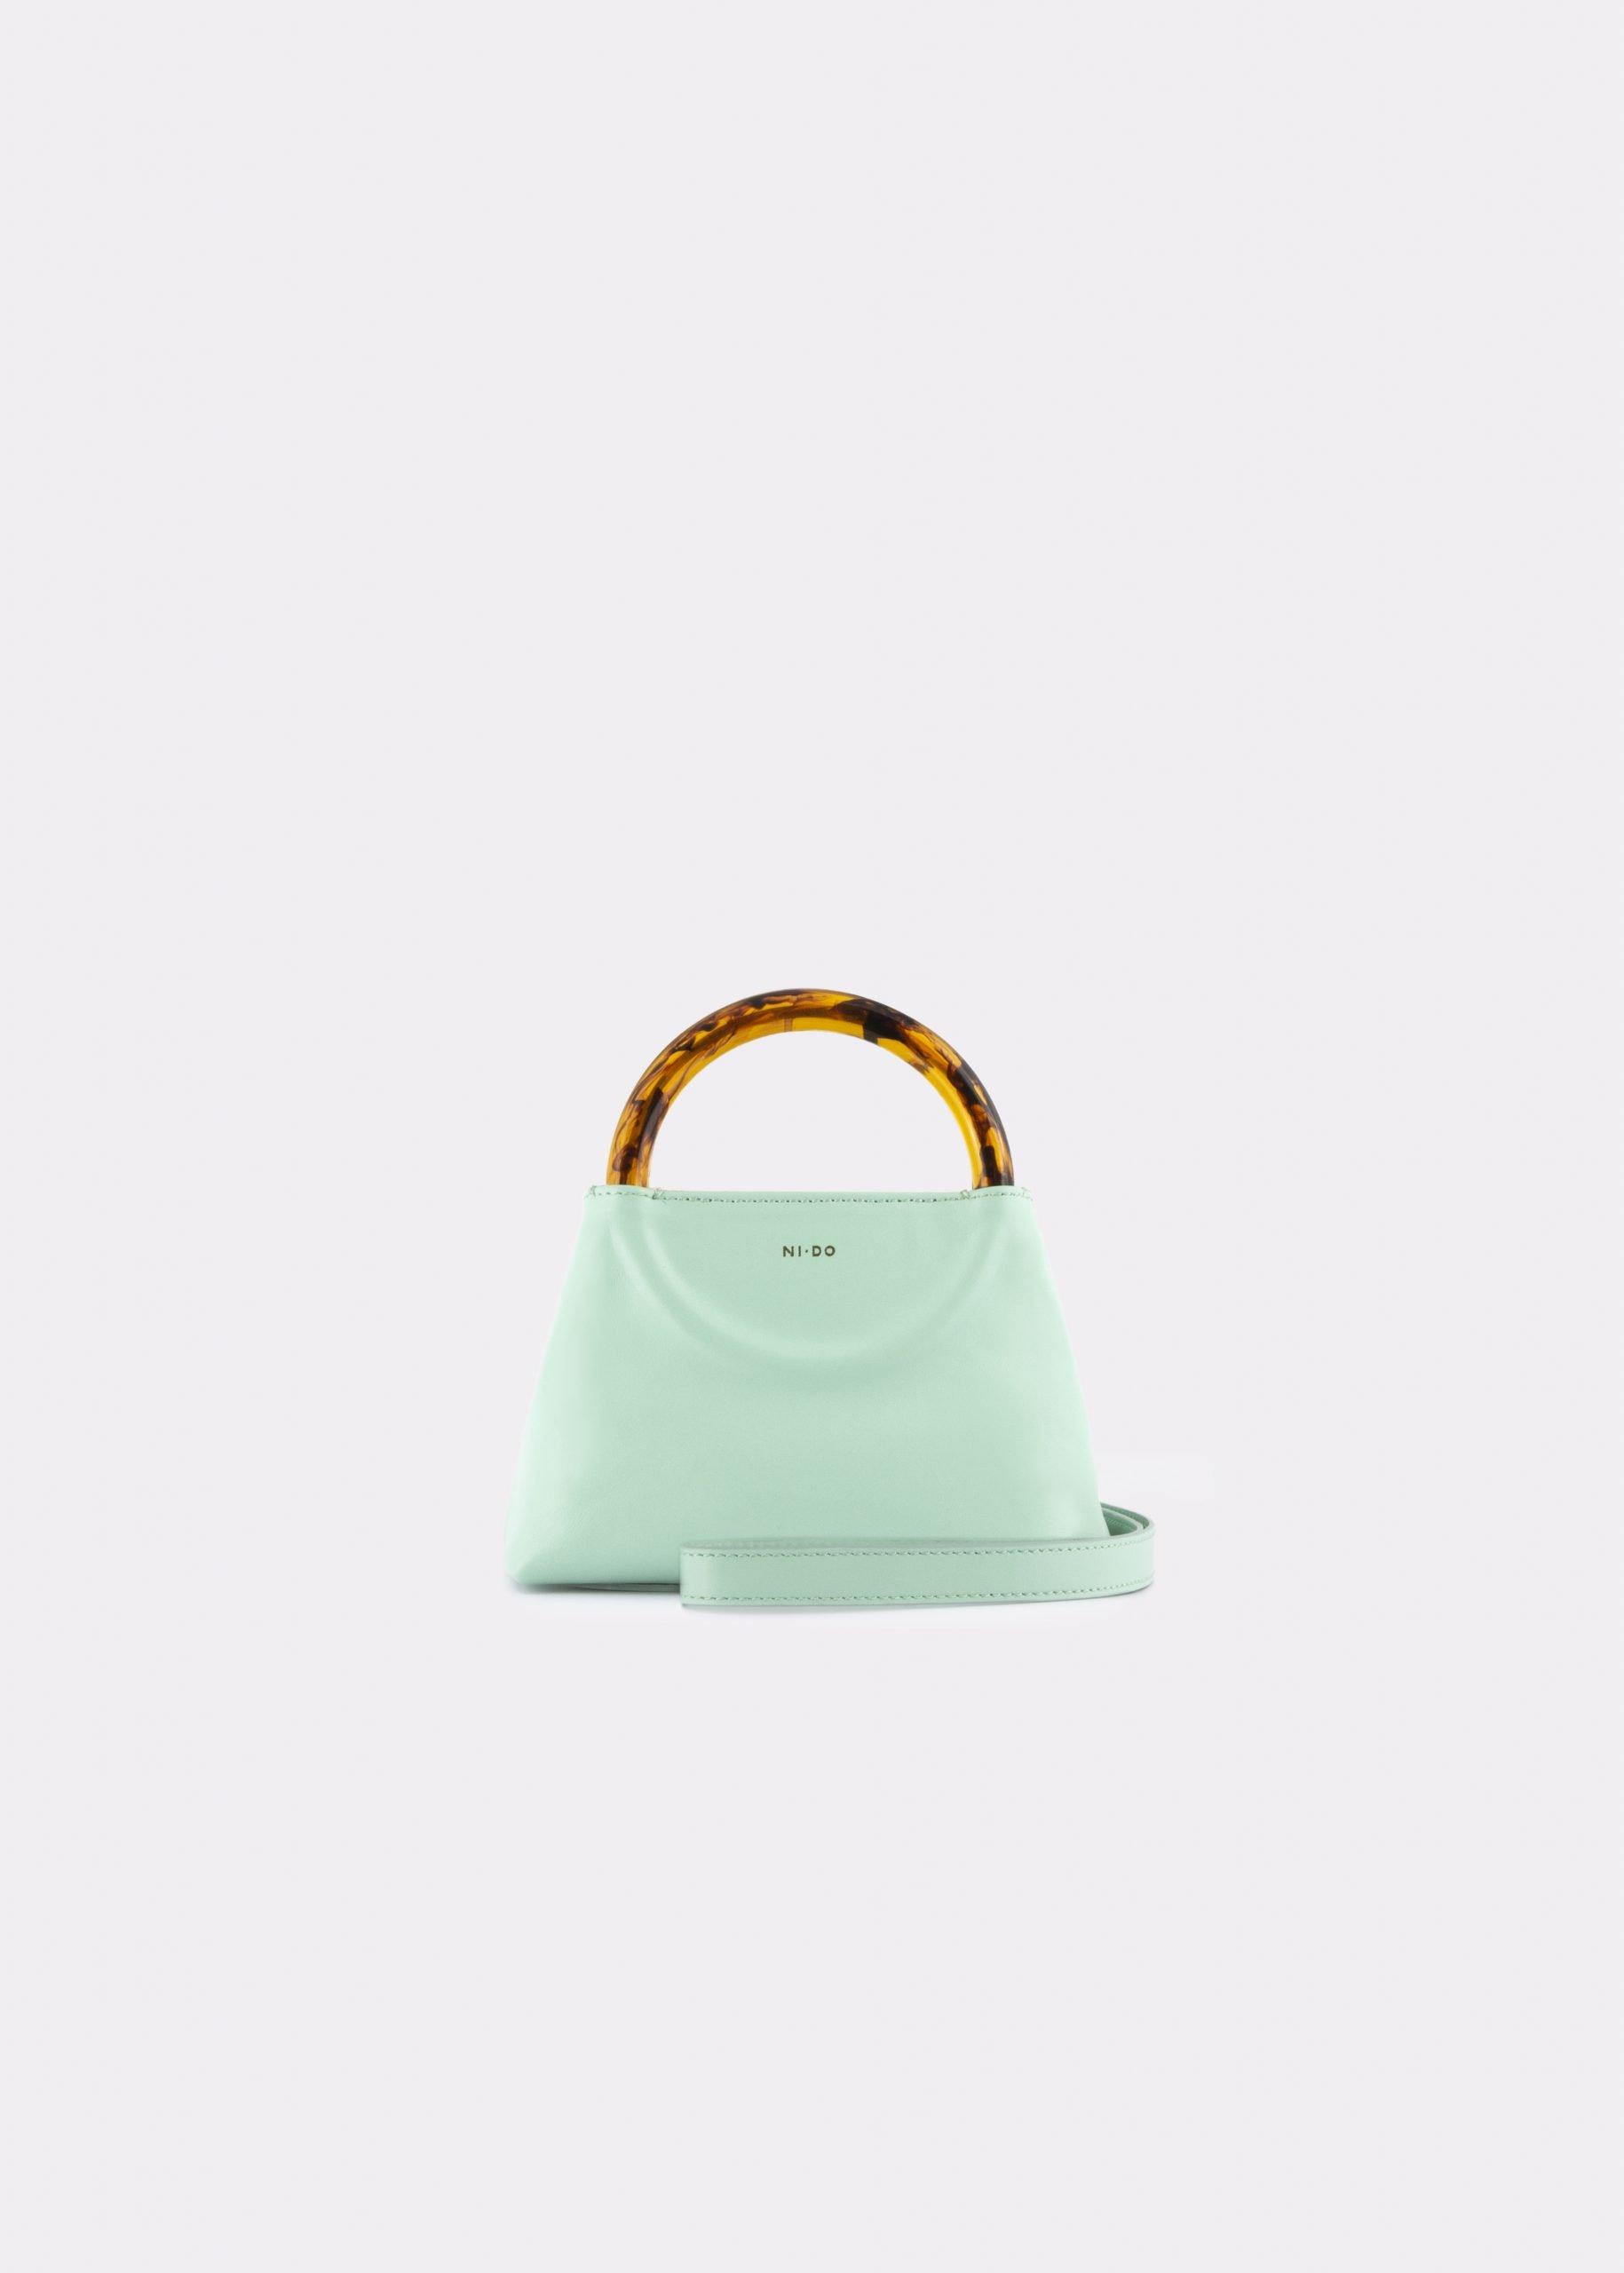 NIDO Bolla Micro bag Pastel Sky leather Amber_shoulder strap view